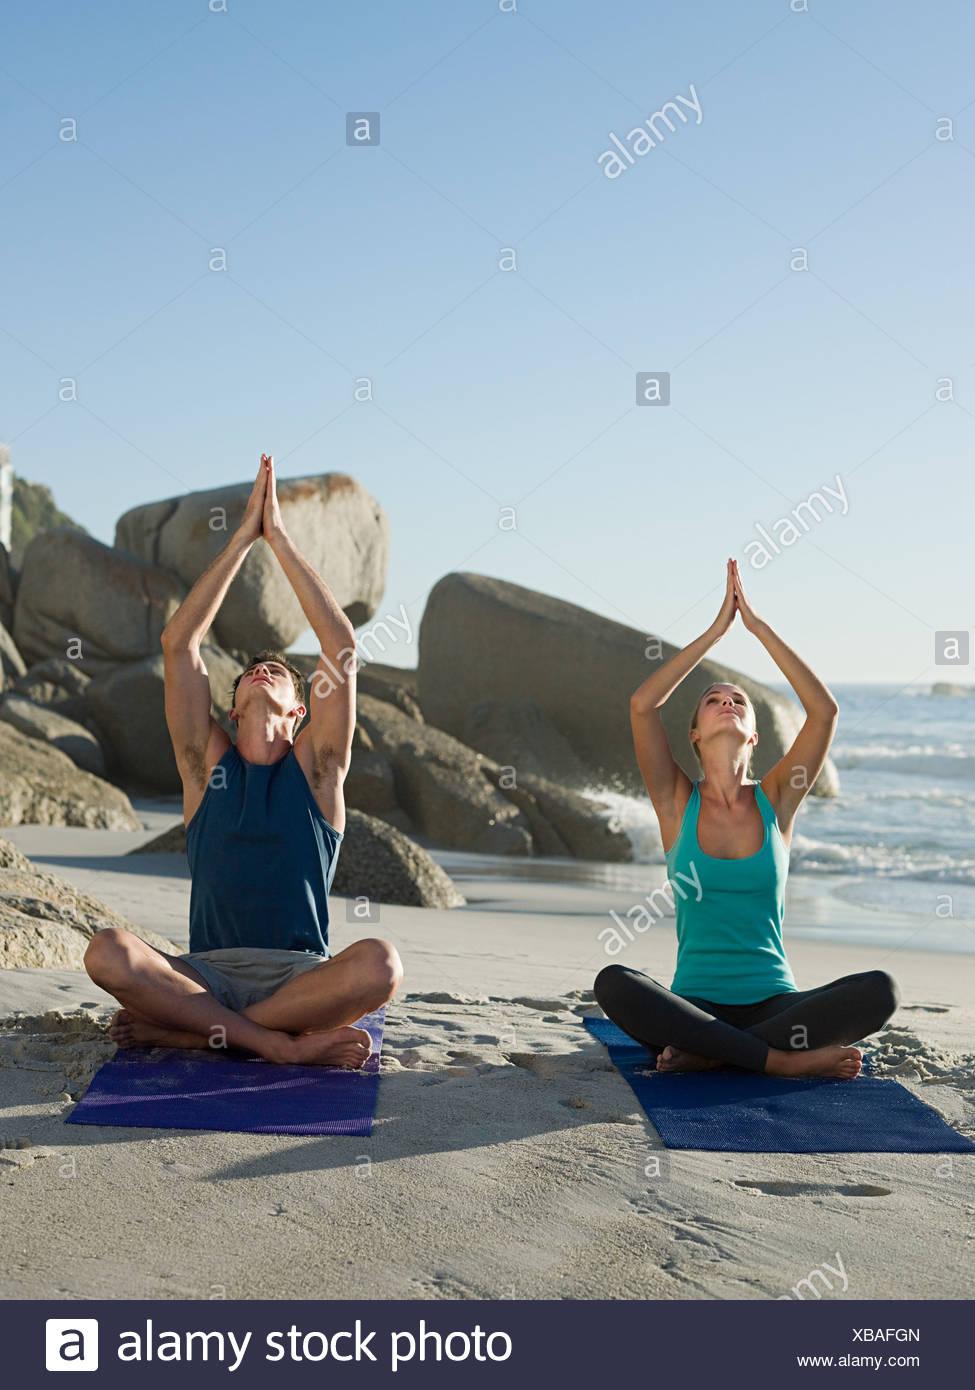 Junges Paar beim Yoga am Strand Stockbild